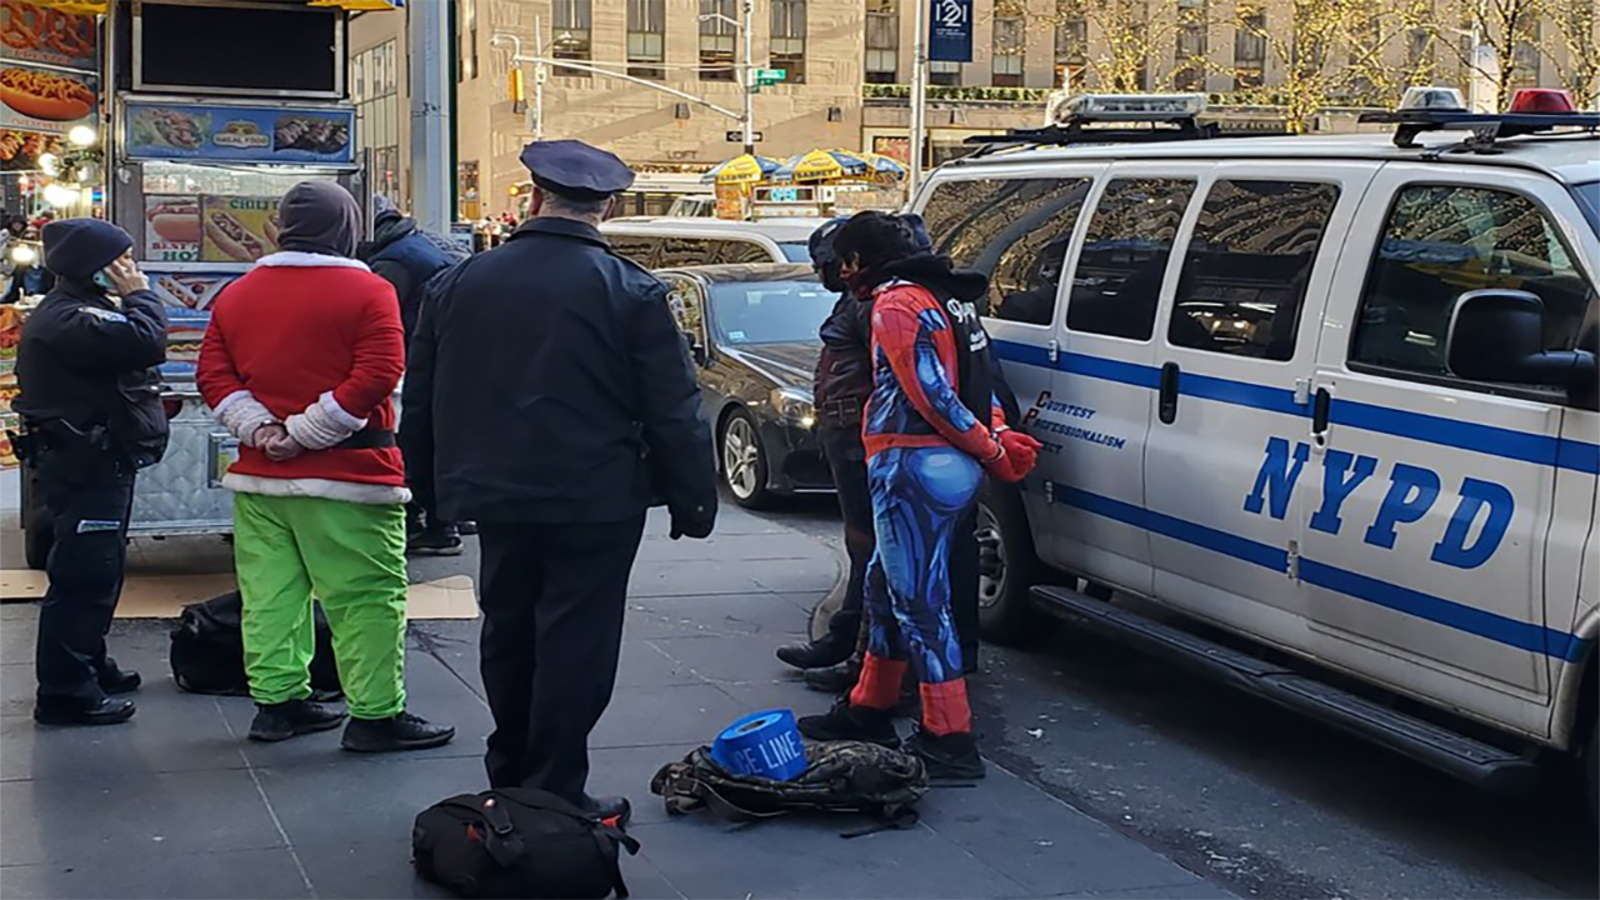 3 costumed characters taken into custody near Rockefeller Center